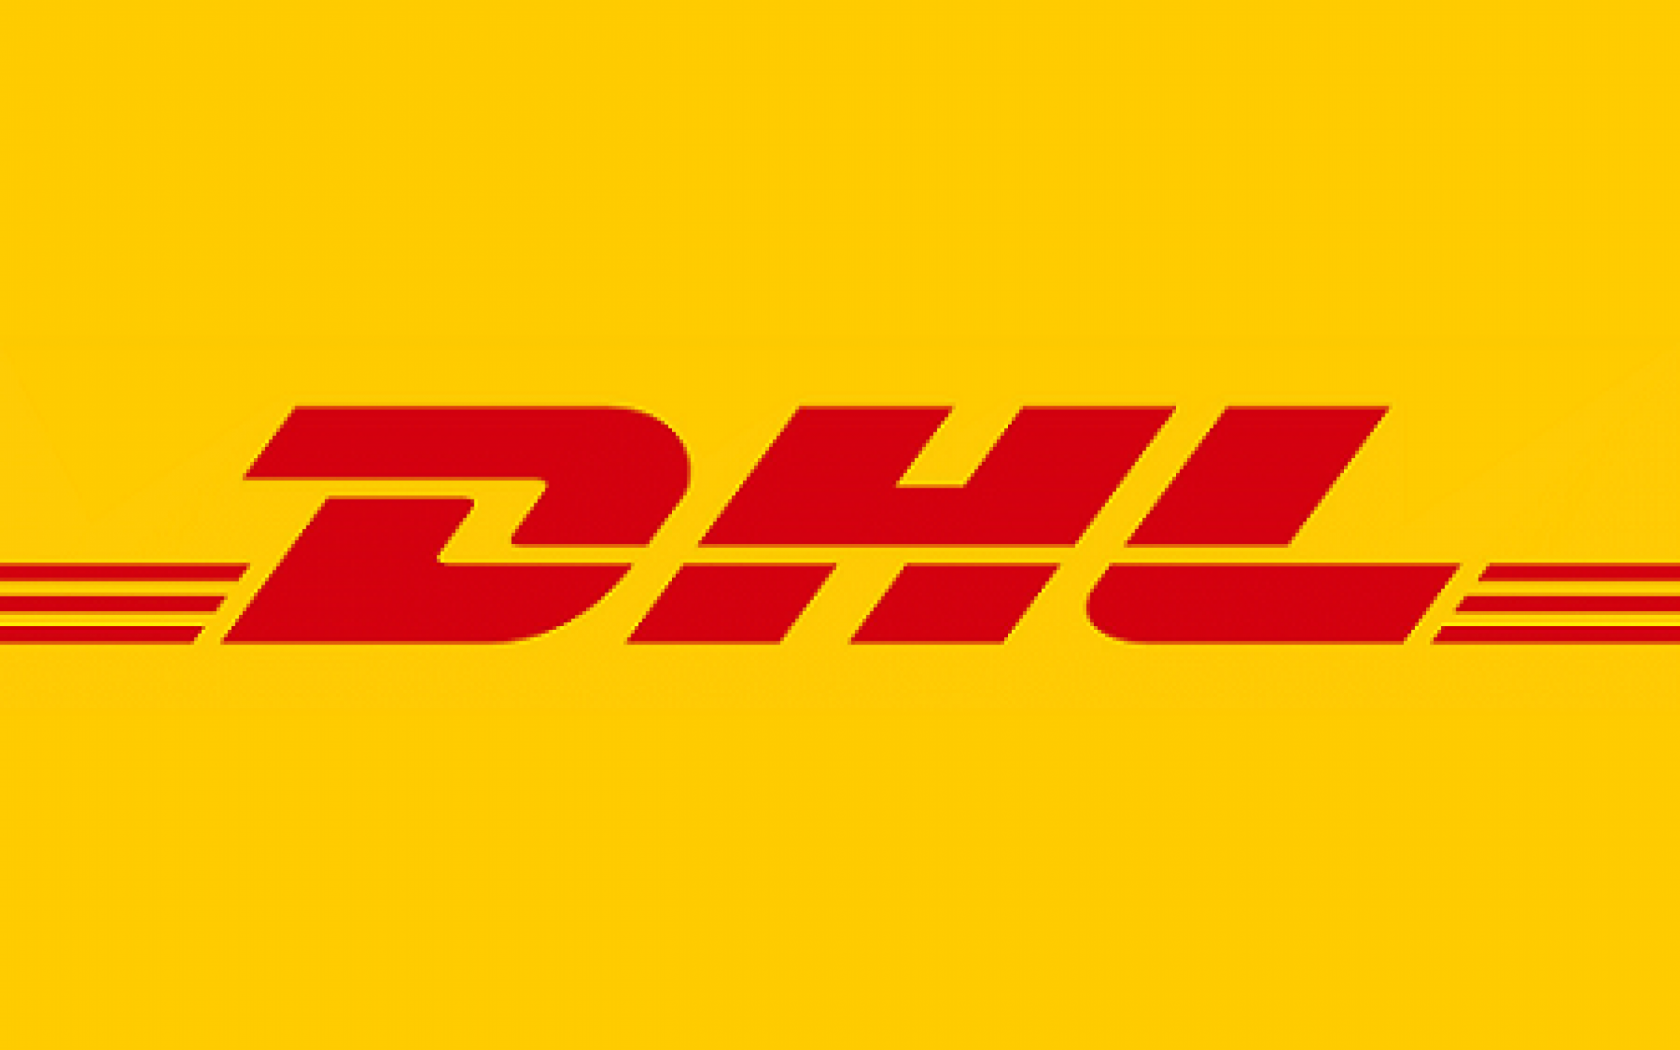 DHL Company Logo Wallpaper PaperPull 1680x1050